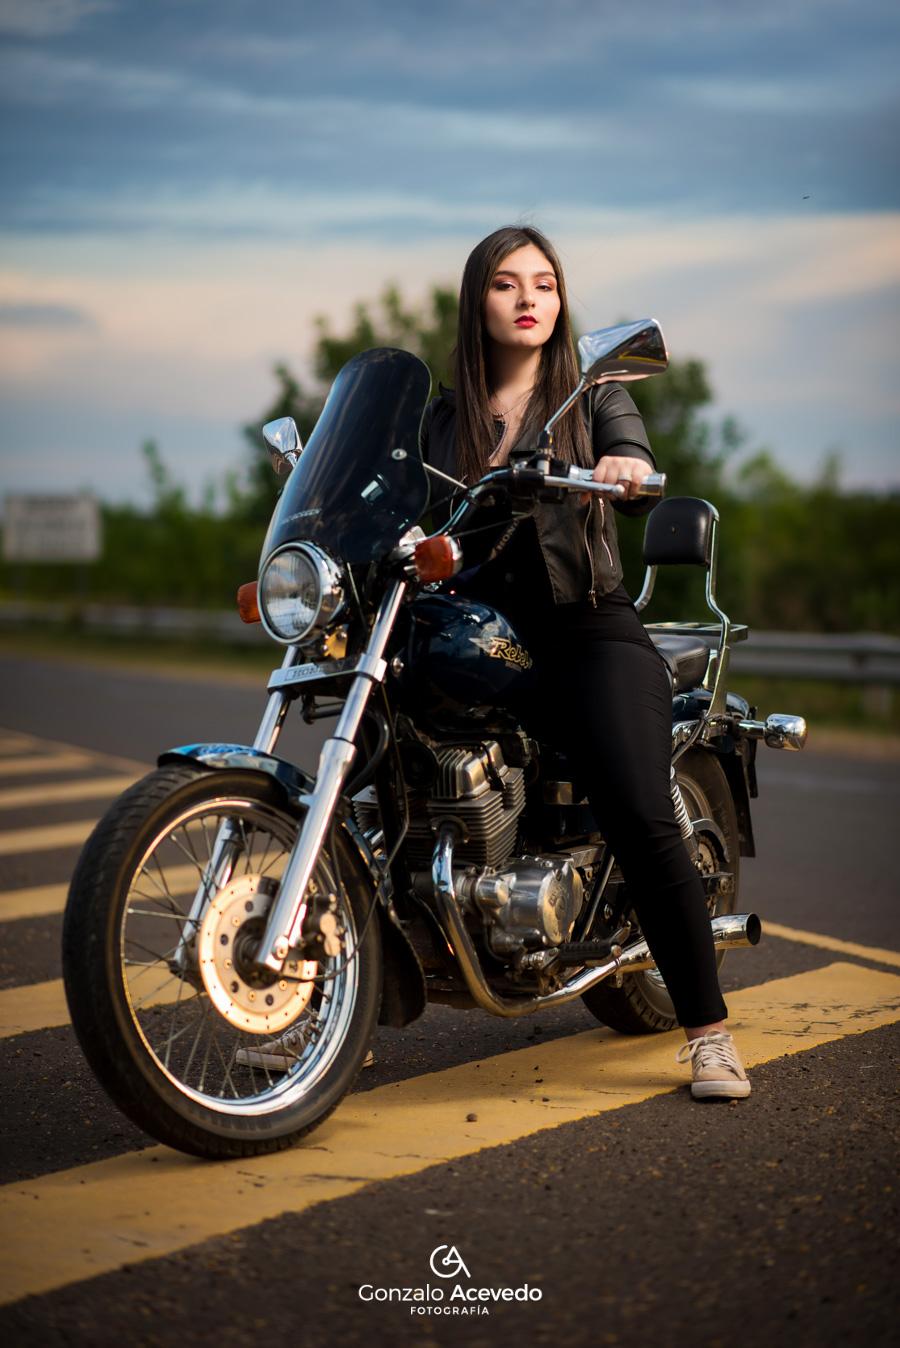 Book urbano con moto unico y diferente Gonzalo Acevedo #gonzaloacevedofotografia